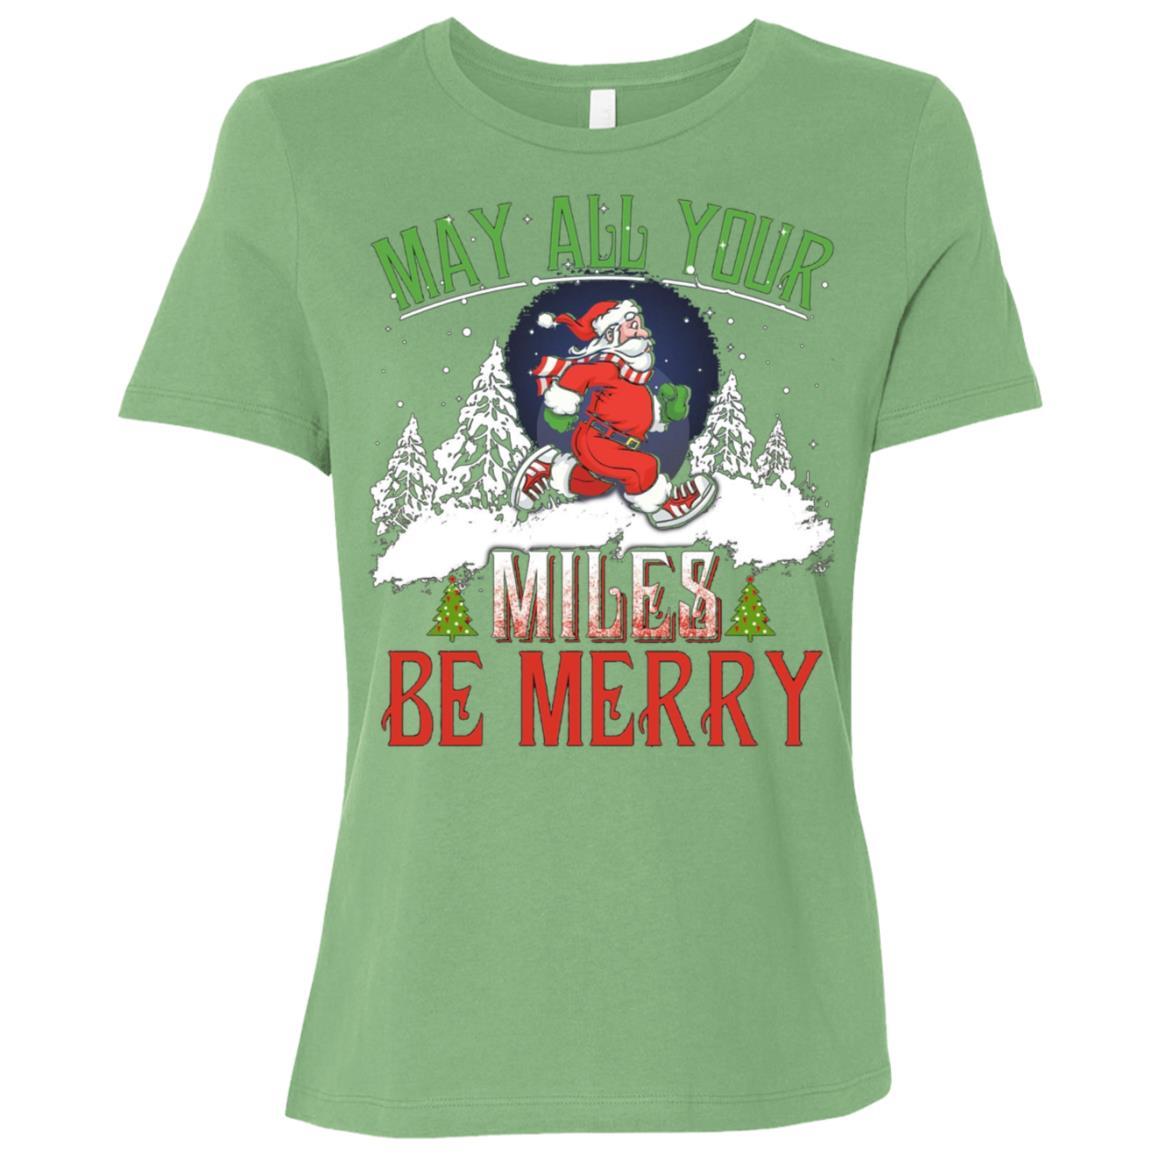 Christmas Running Womens Funny Running Gift Women Short Sleeve T-Shirt